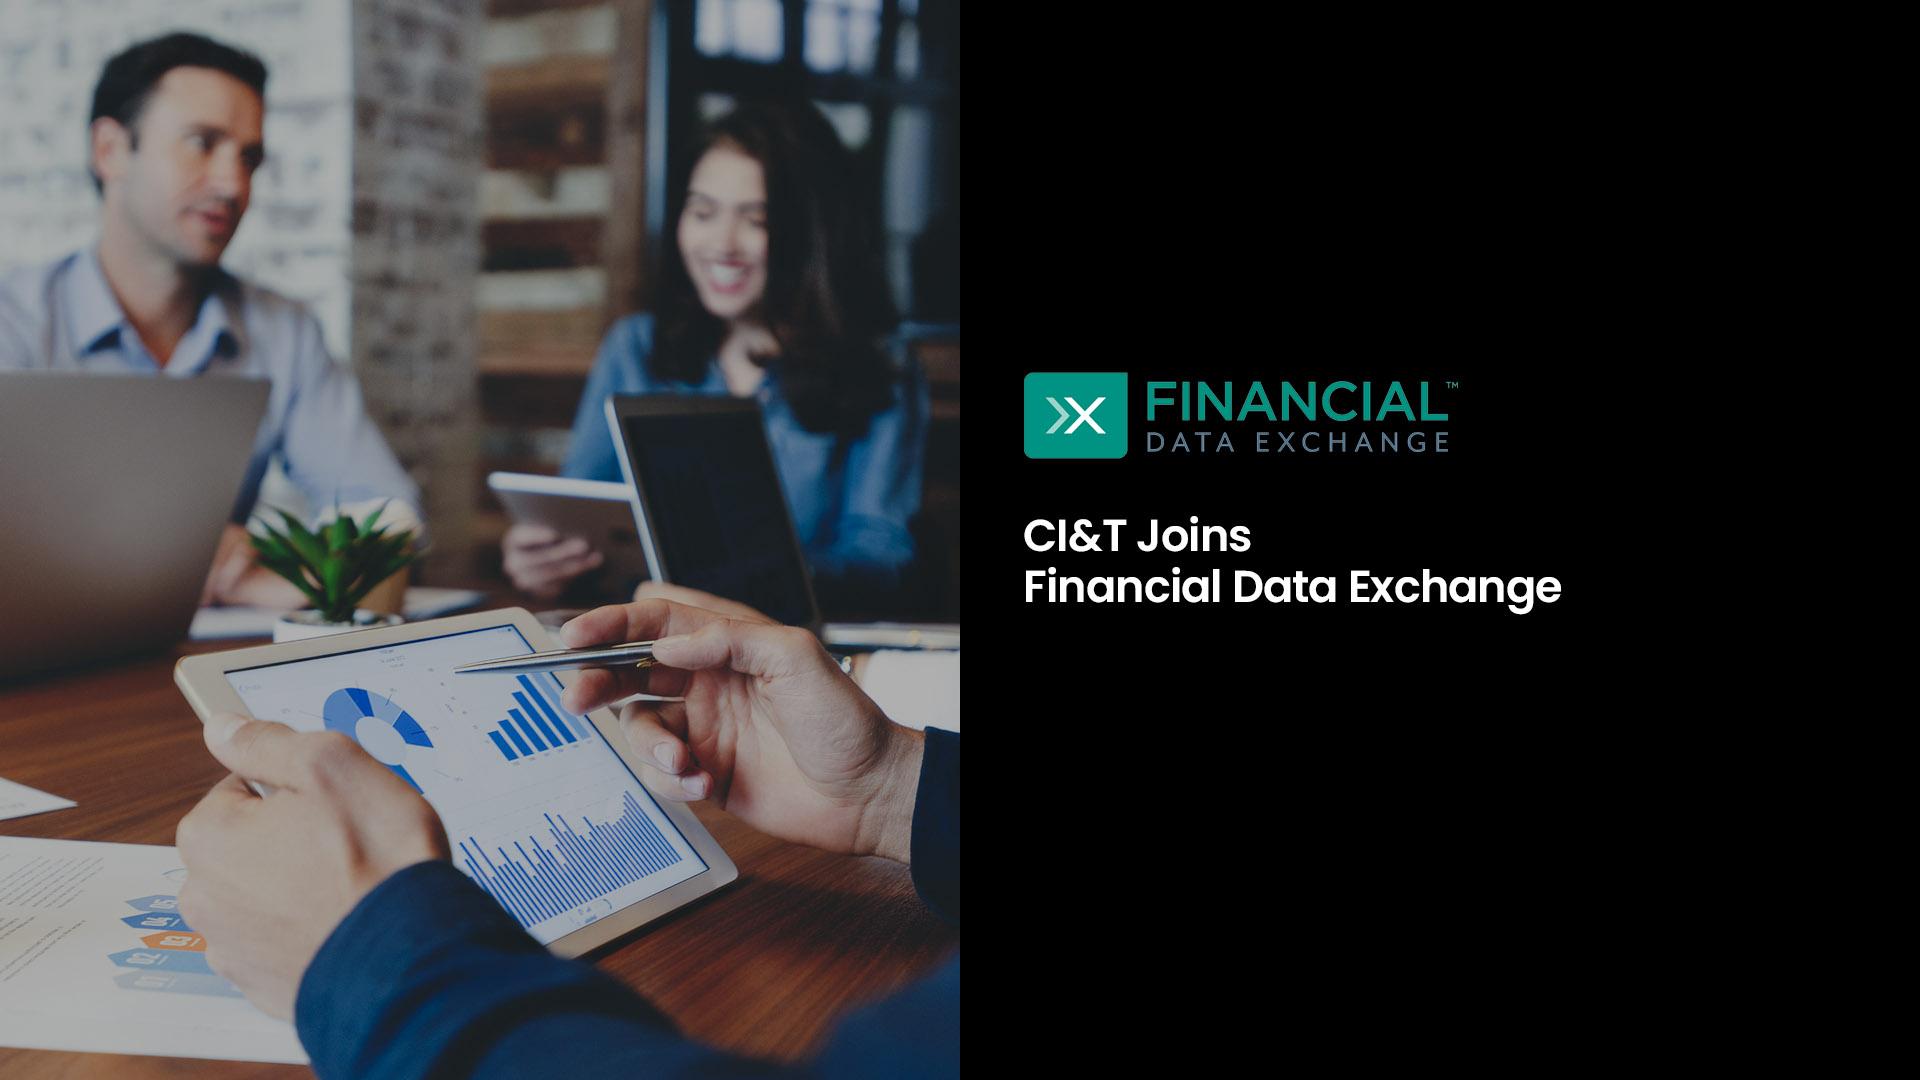 CI&T Joins Financial Data Exchange (FDX)